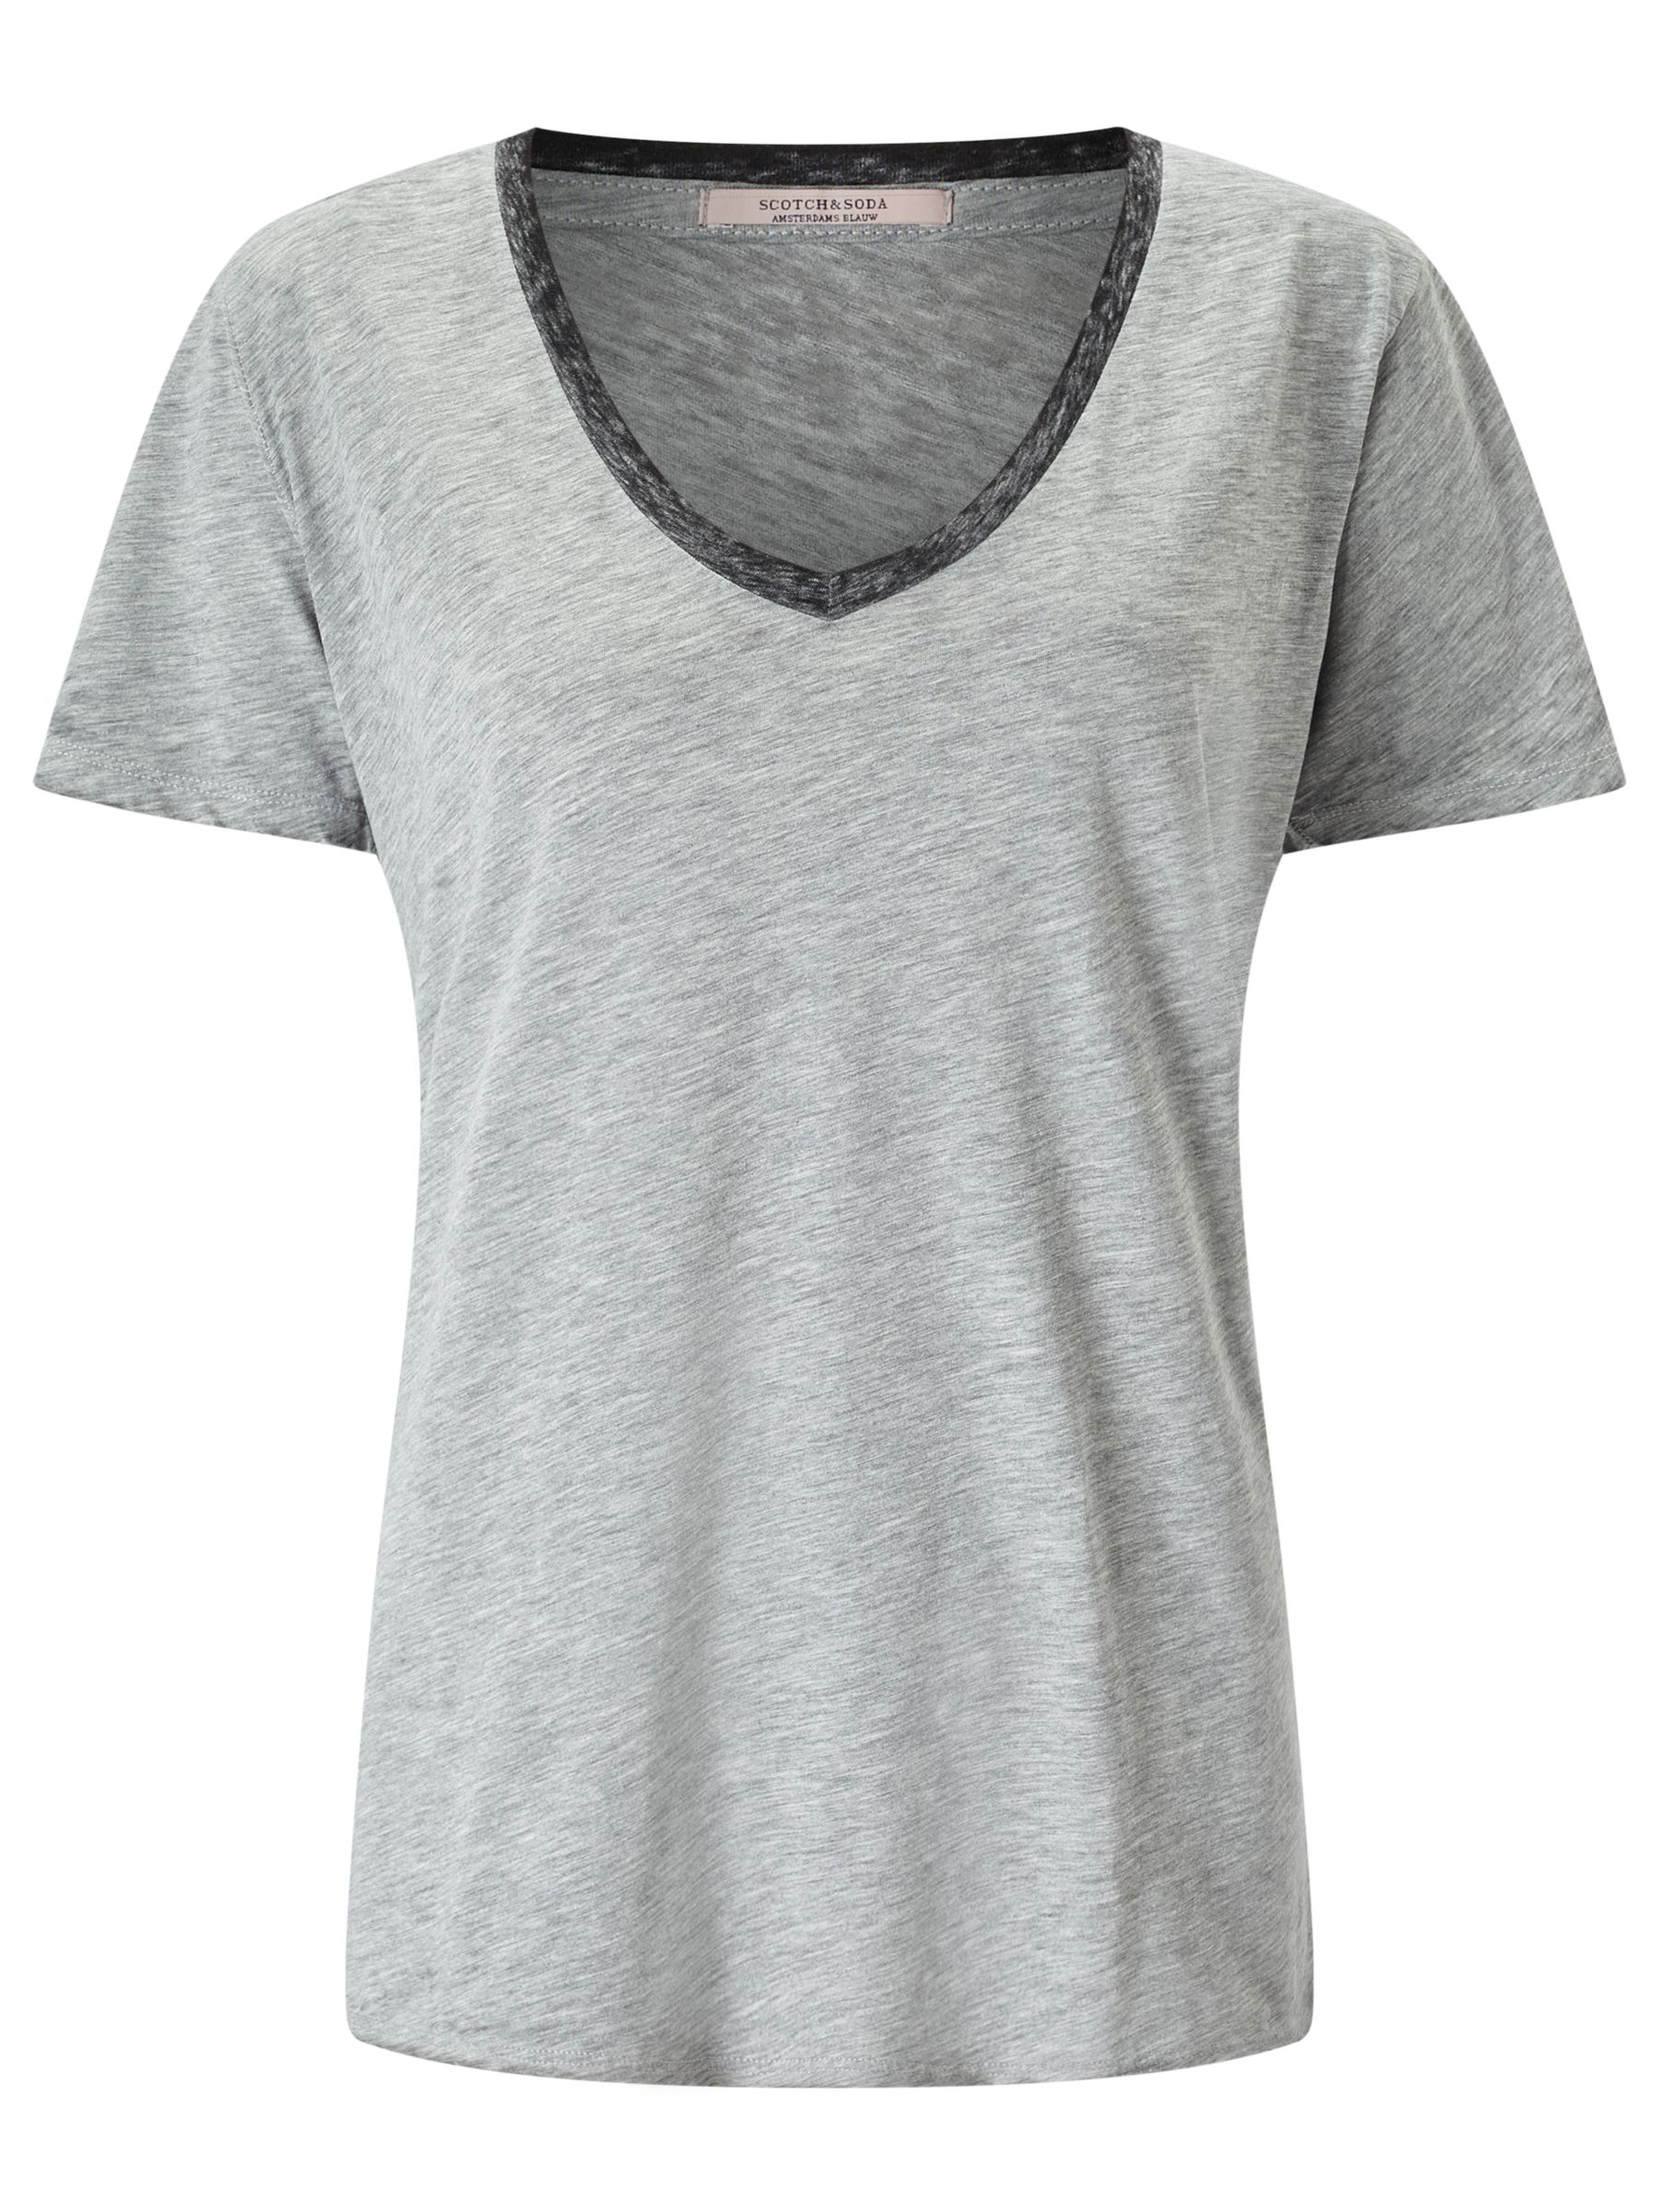 Maison Scotch Maison Scotch Burnout Deep V-Neck T-Shirt, Grey Melange